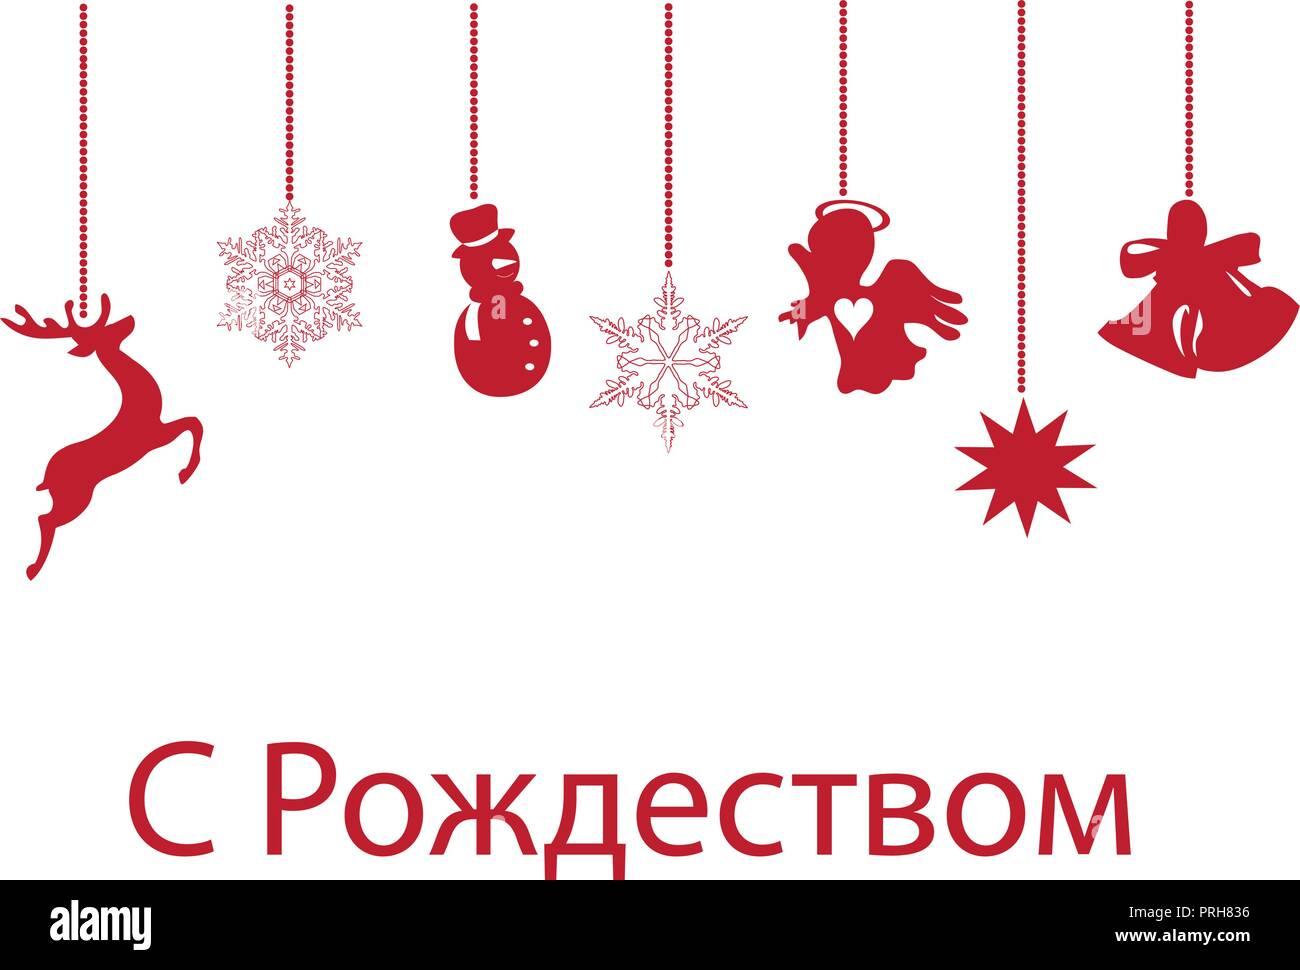 Russisch Frohe Weihnachten.Vector Abbildung Frohe Weihnachten Hintergrund In Russisch